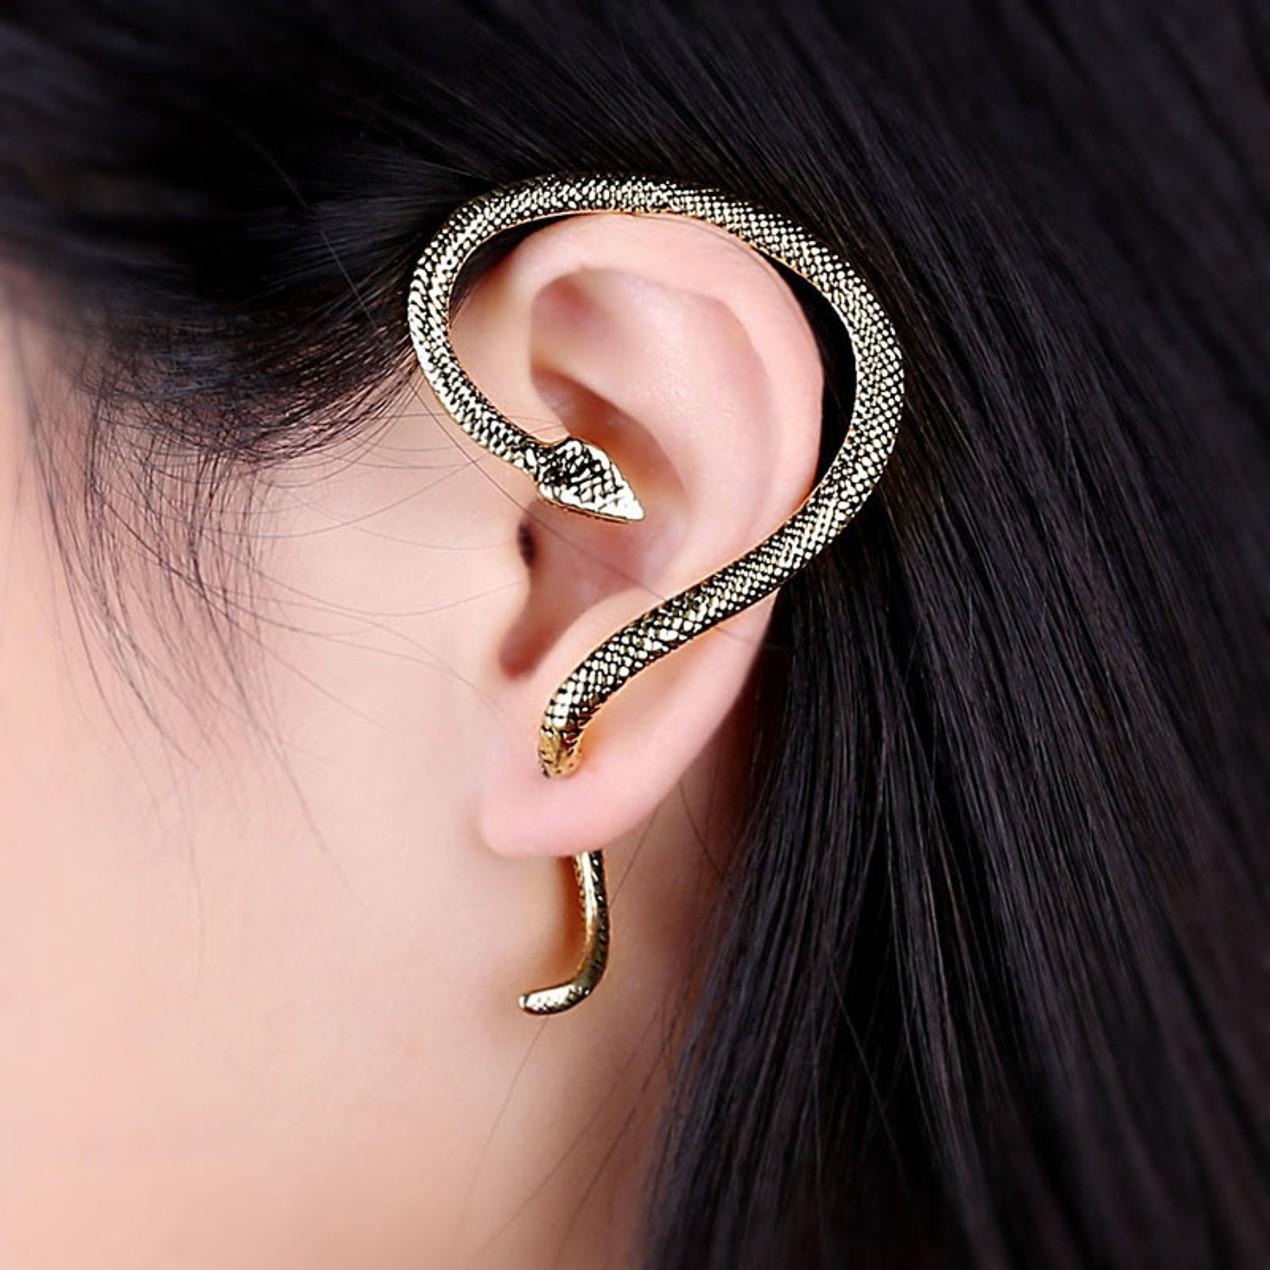 227f69691bad9 Gothic Punk Snake Wind Temptation Silver Ear Stud Cuff Earrings - Tanga